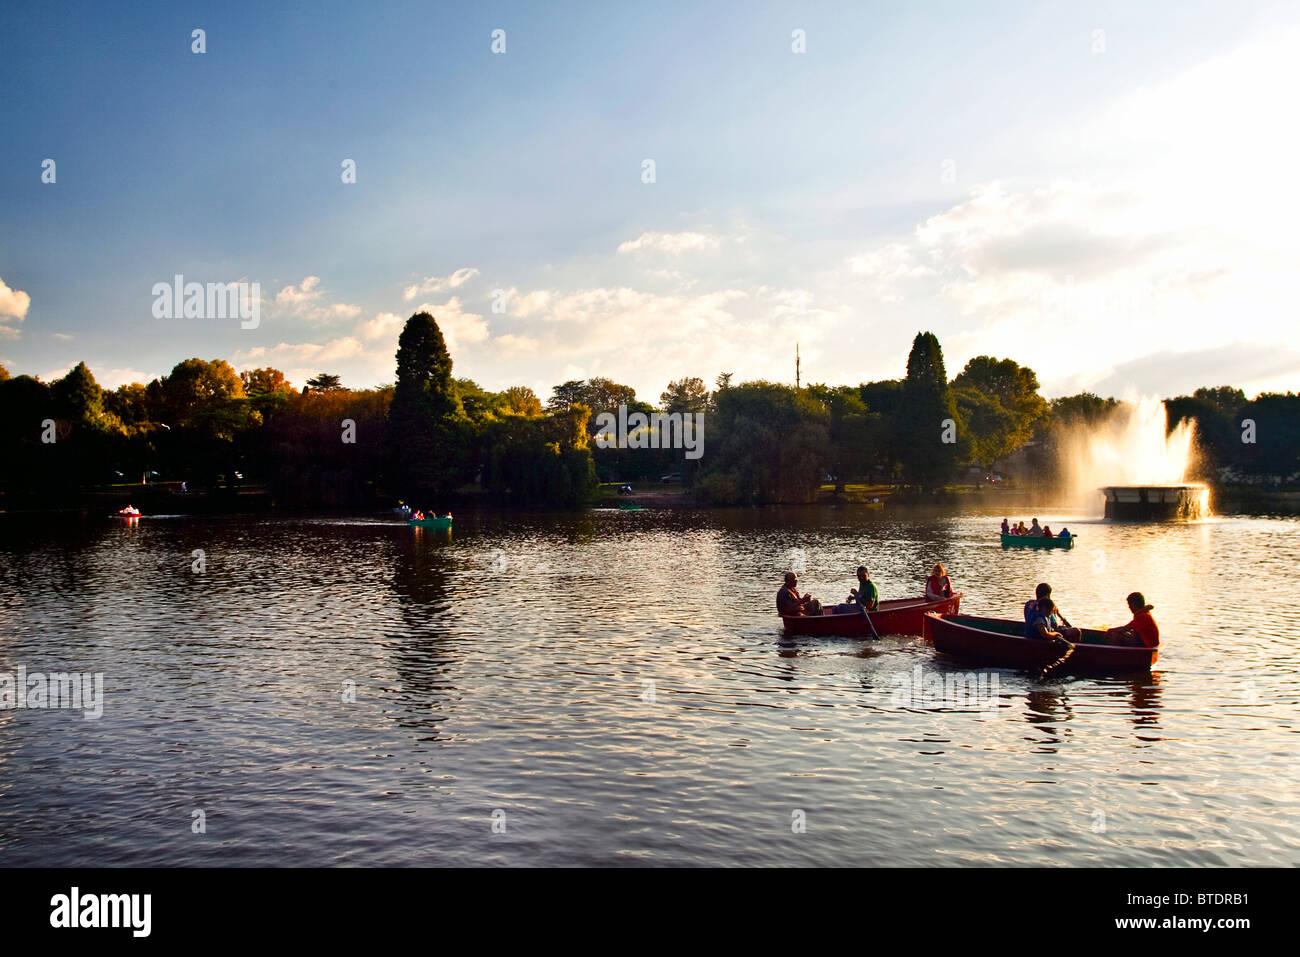 Rowing boats on Zoo lake at dusk - Stock Image